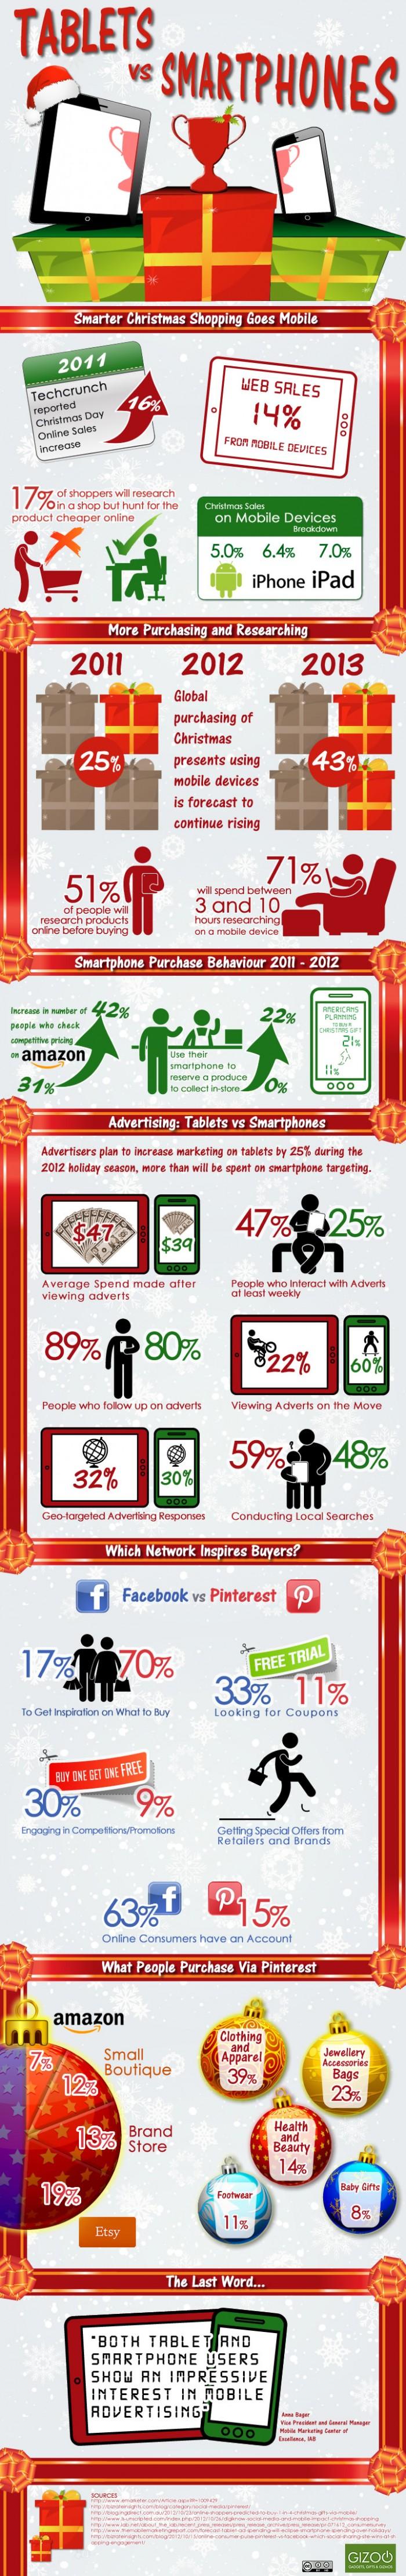 tablets-vs-smartphones--xmas-shopping-spree_